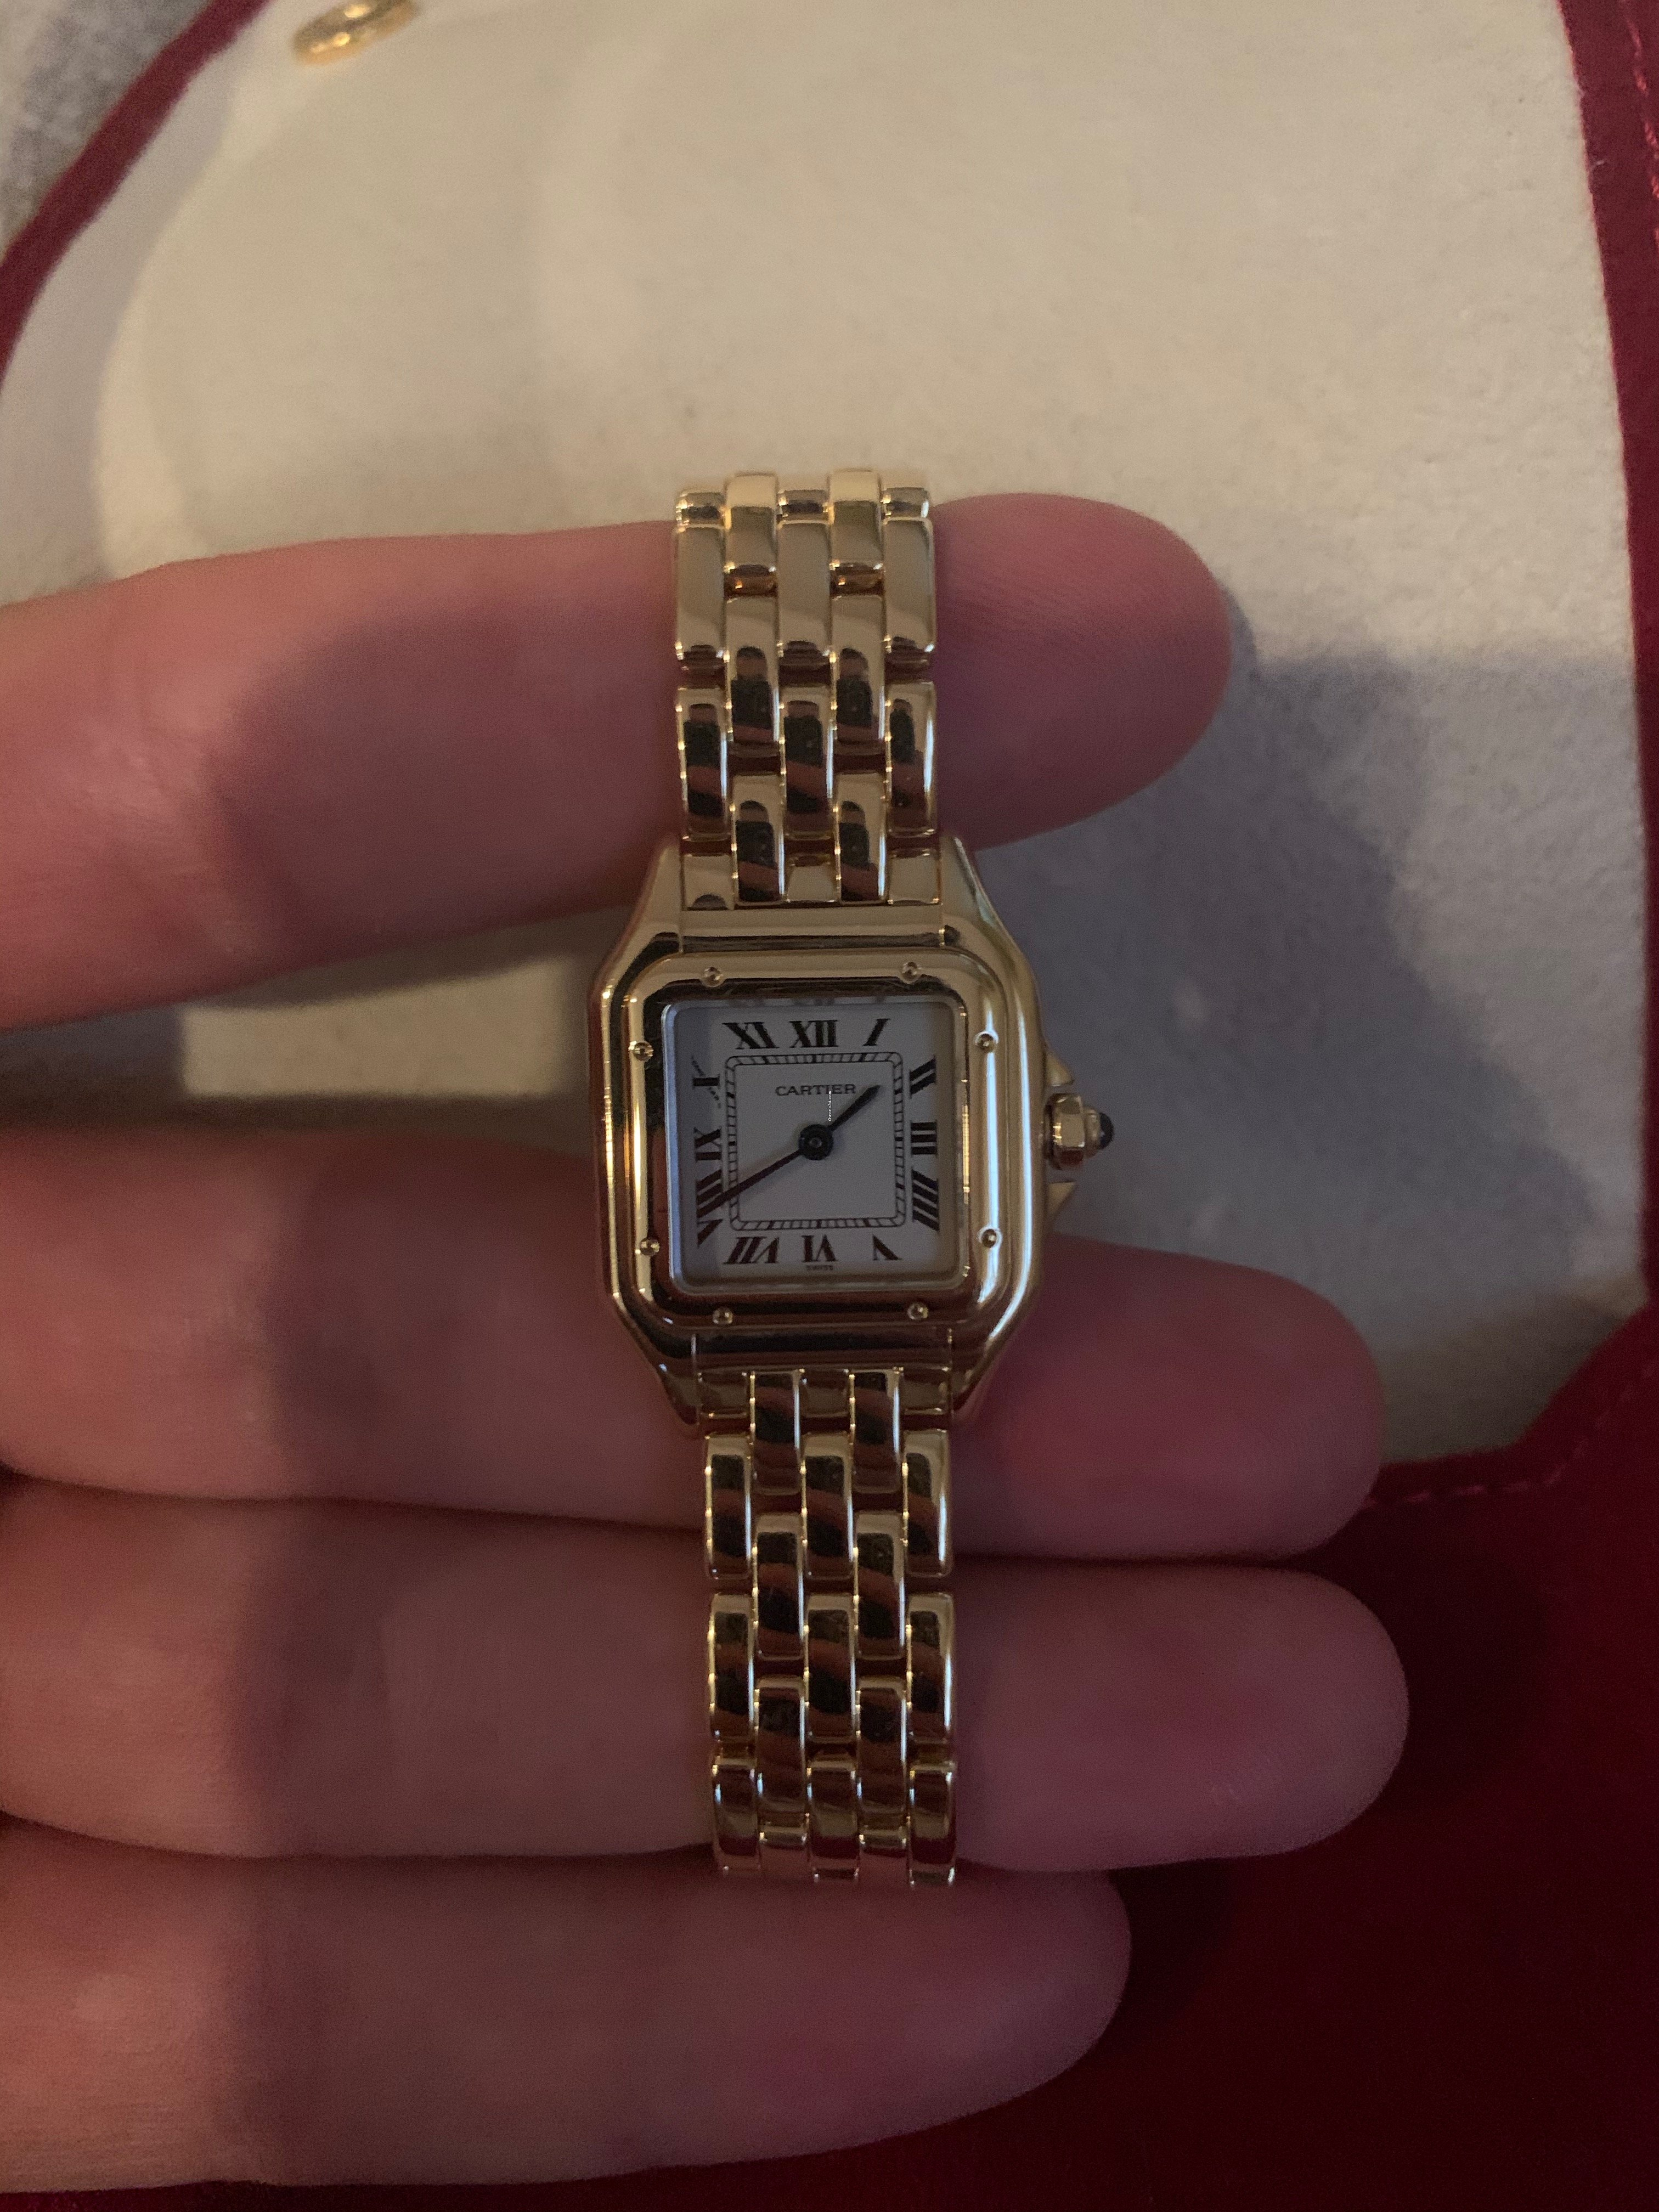 Panthere Cartier de Cartier cuarzo mujer reloj 1070